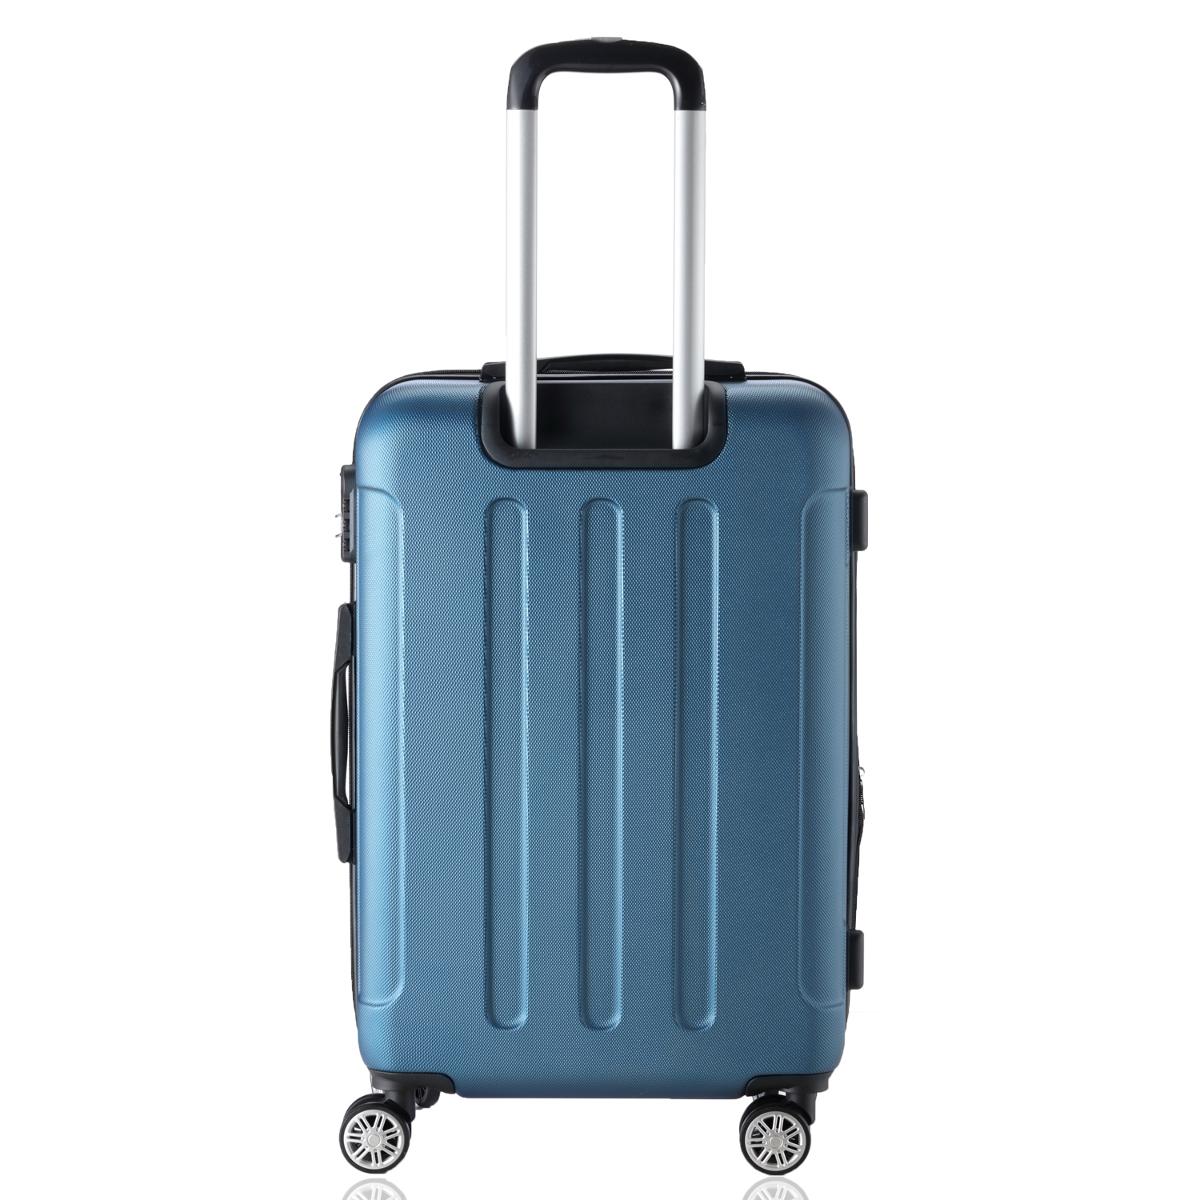 Koffer-Flexot-2045-Hartschalenkoffer-Trolley-Kofferset-Reisekoffer-M-L-XL-Set Indexbild 13